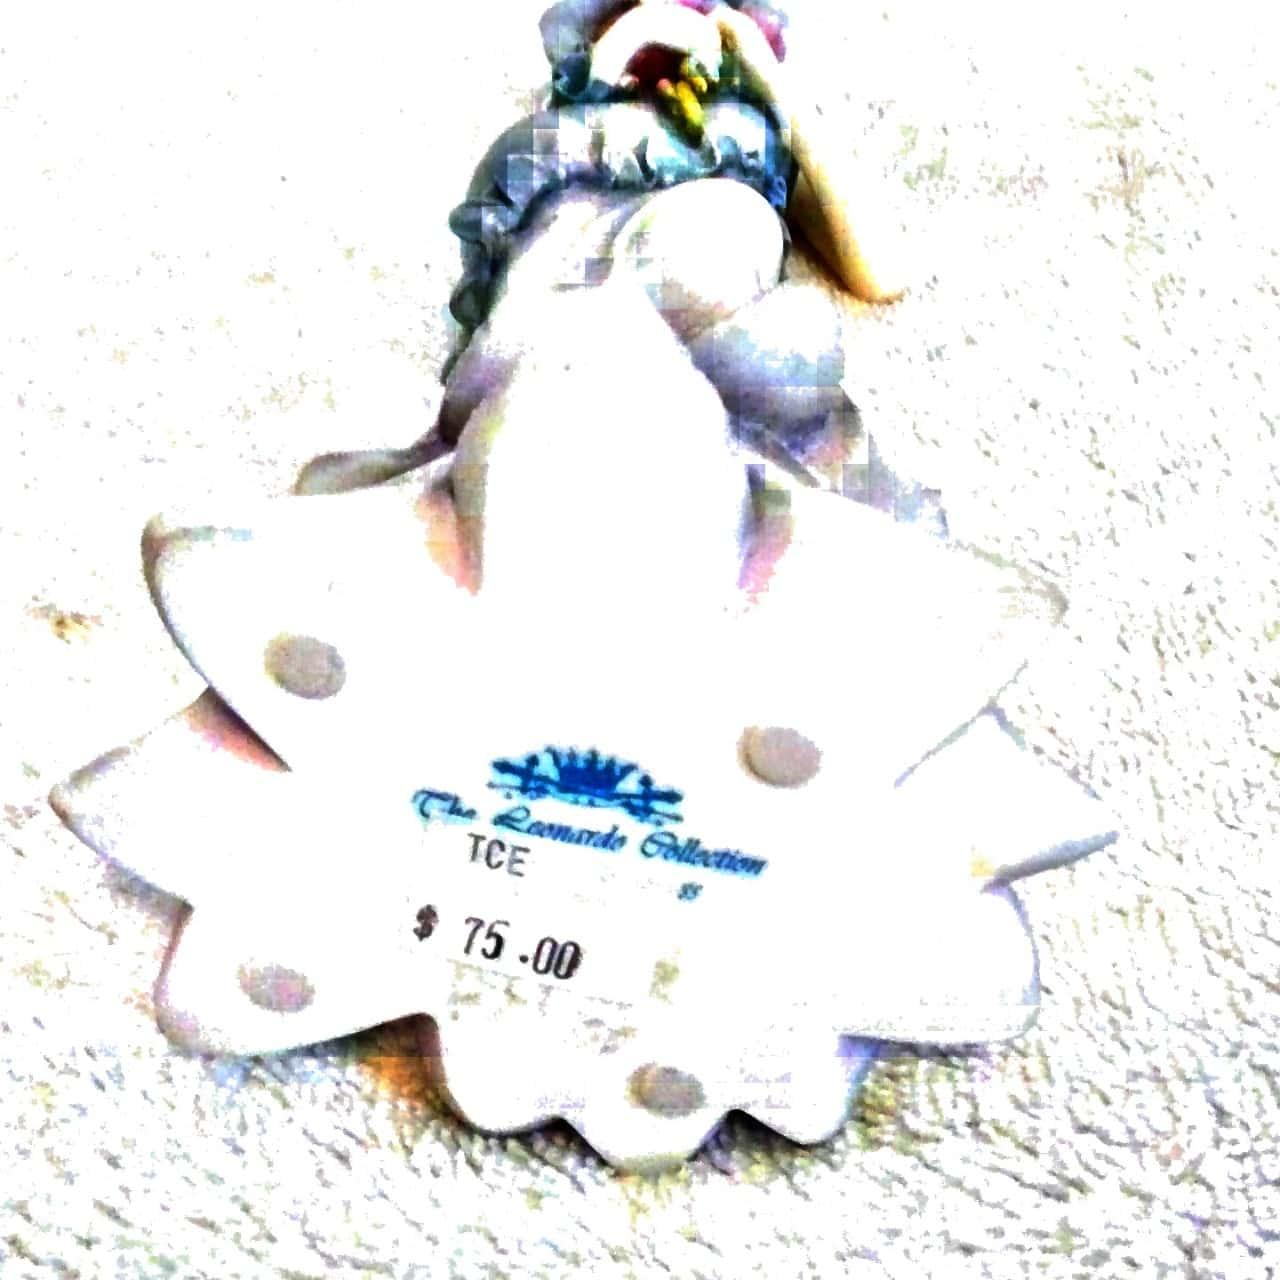 LEONARDO FIGURINE 'FLOWER PRINCESS 'BLUE' Approx 25cm tall RRP $75.00